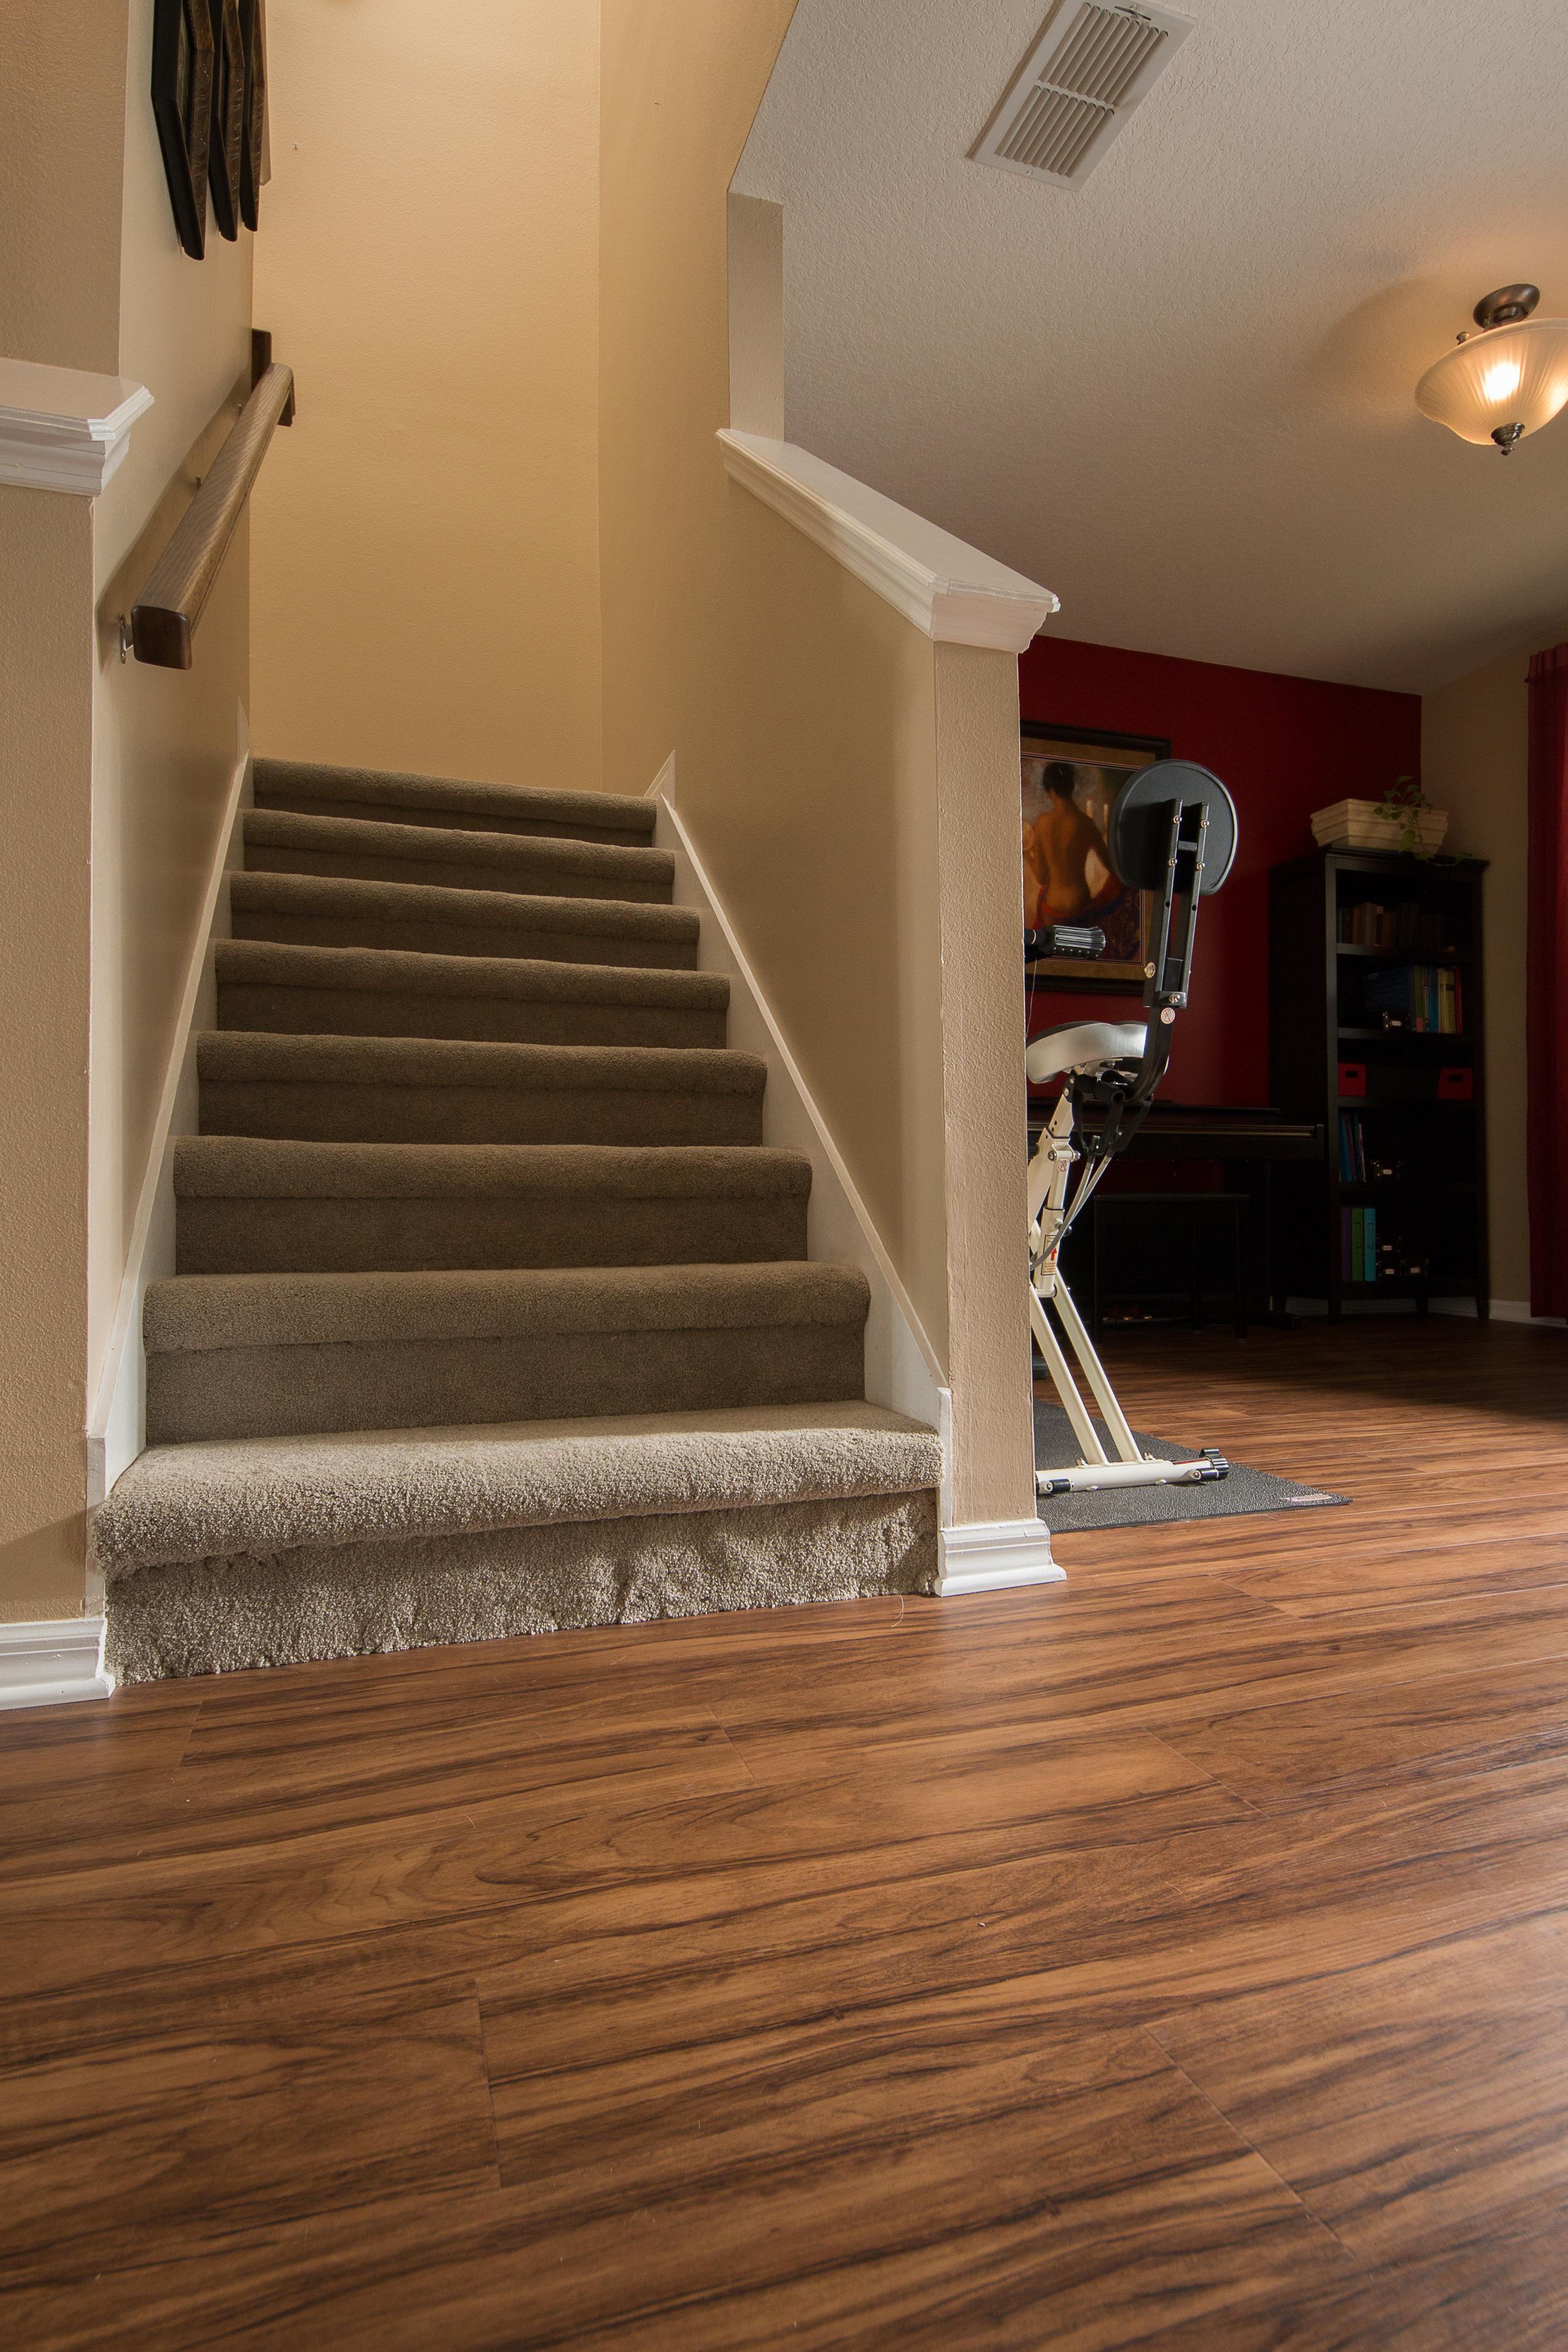 Wood Look Pvc Vinyl Amp Grey Carpet Ability Wood Flooring